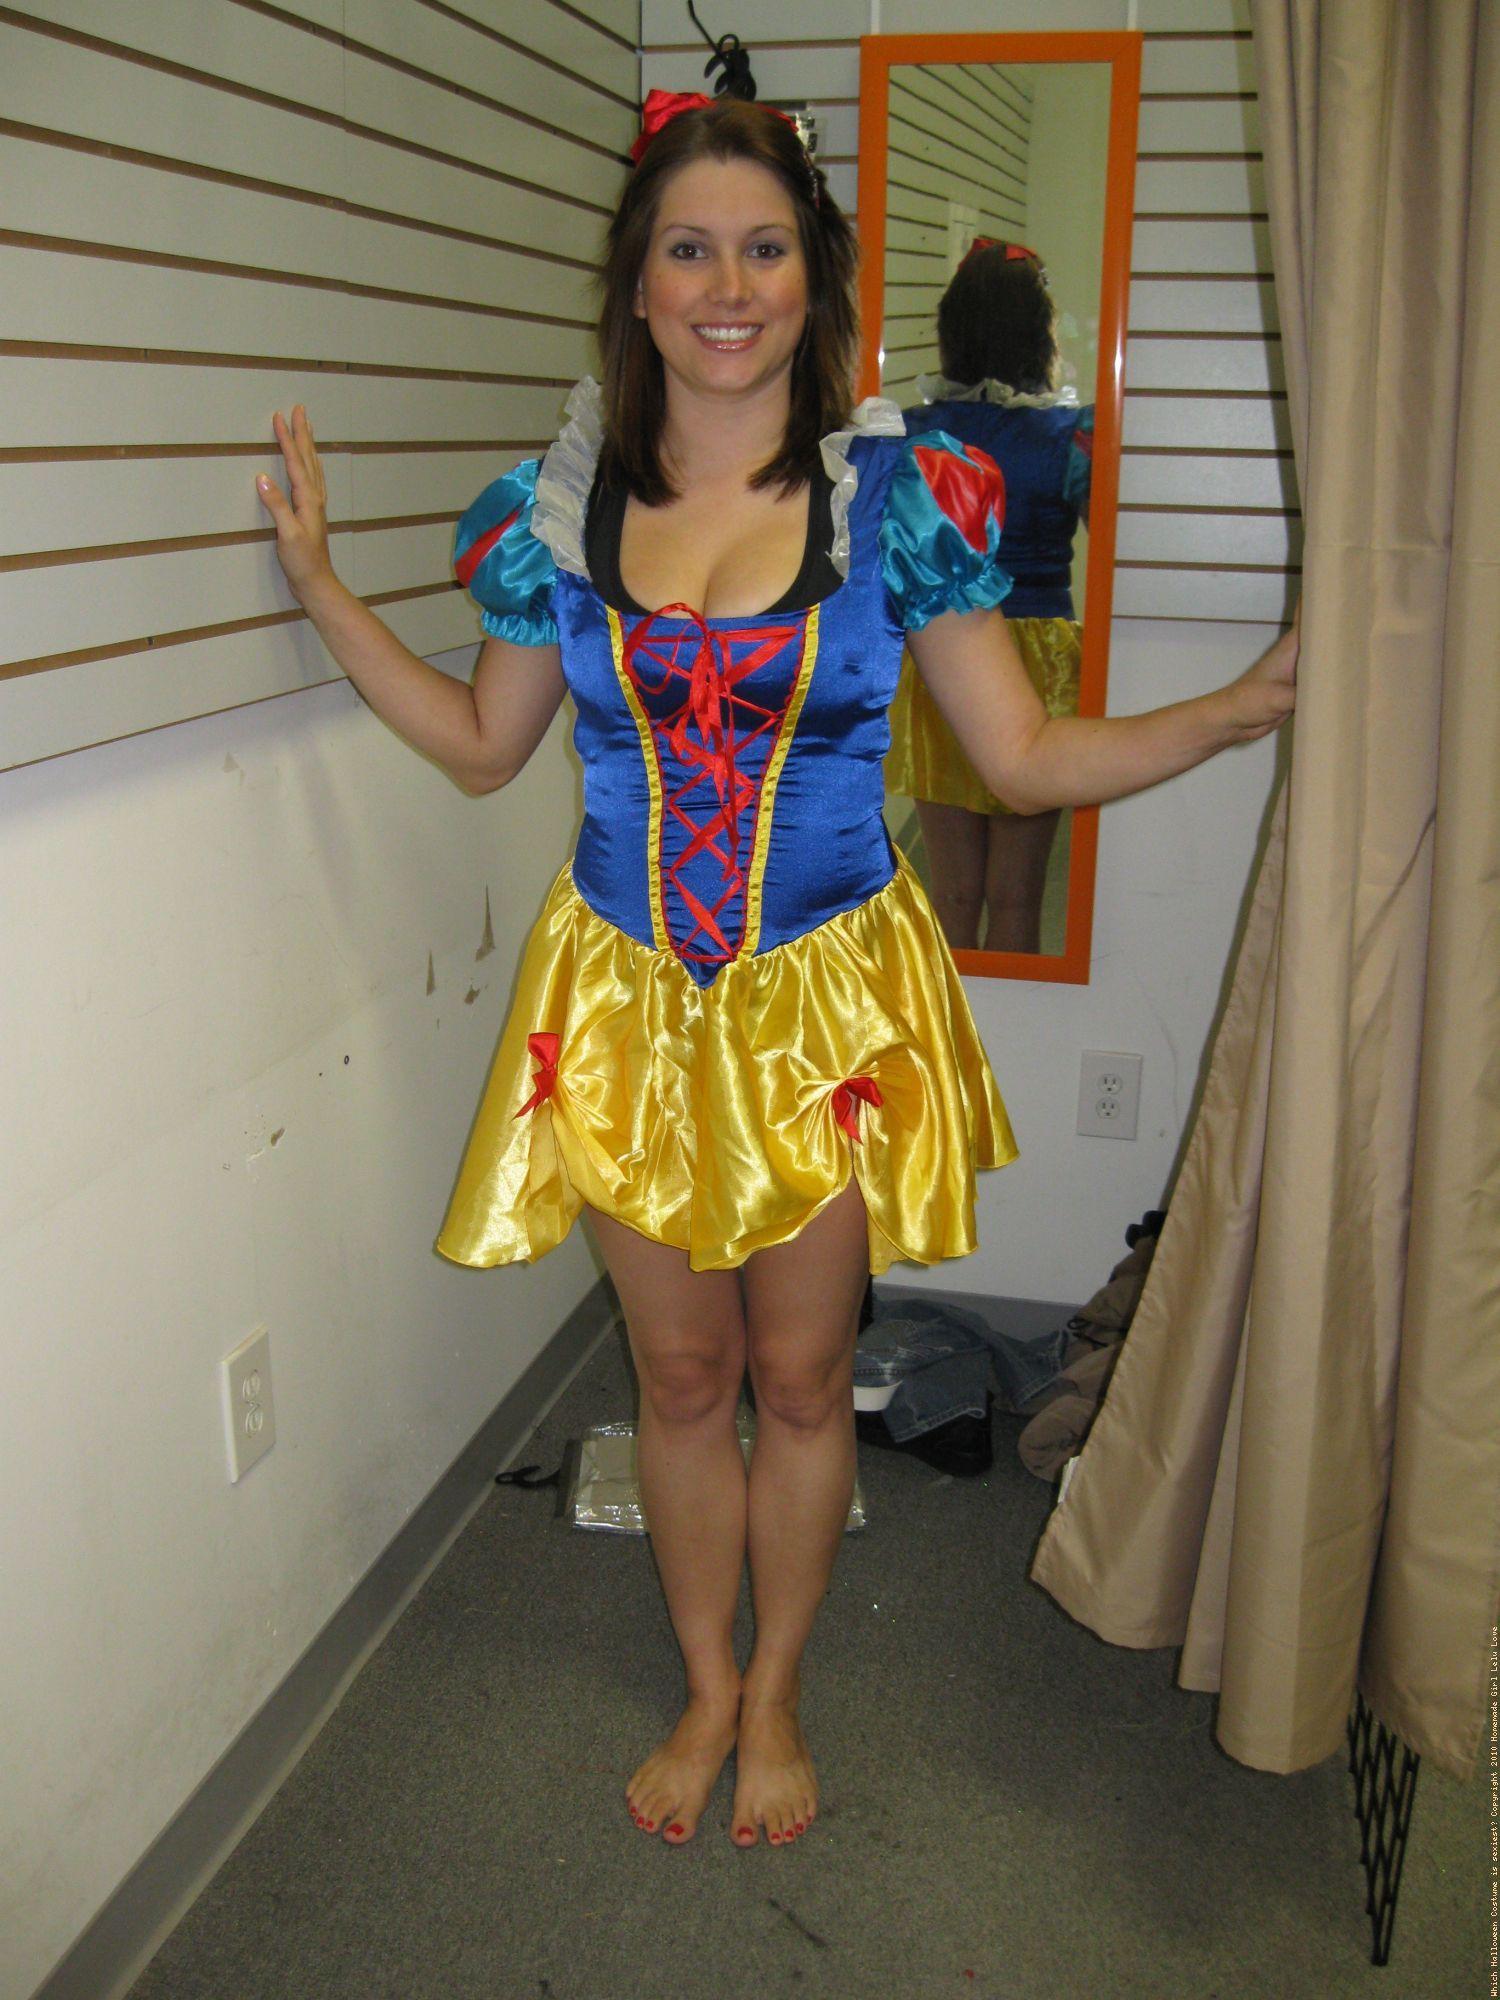 Raggedy anne costume sexy